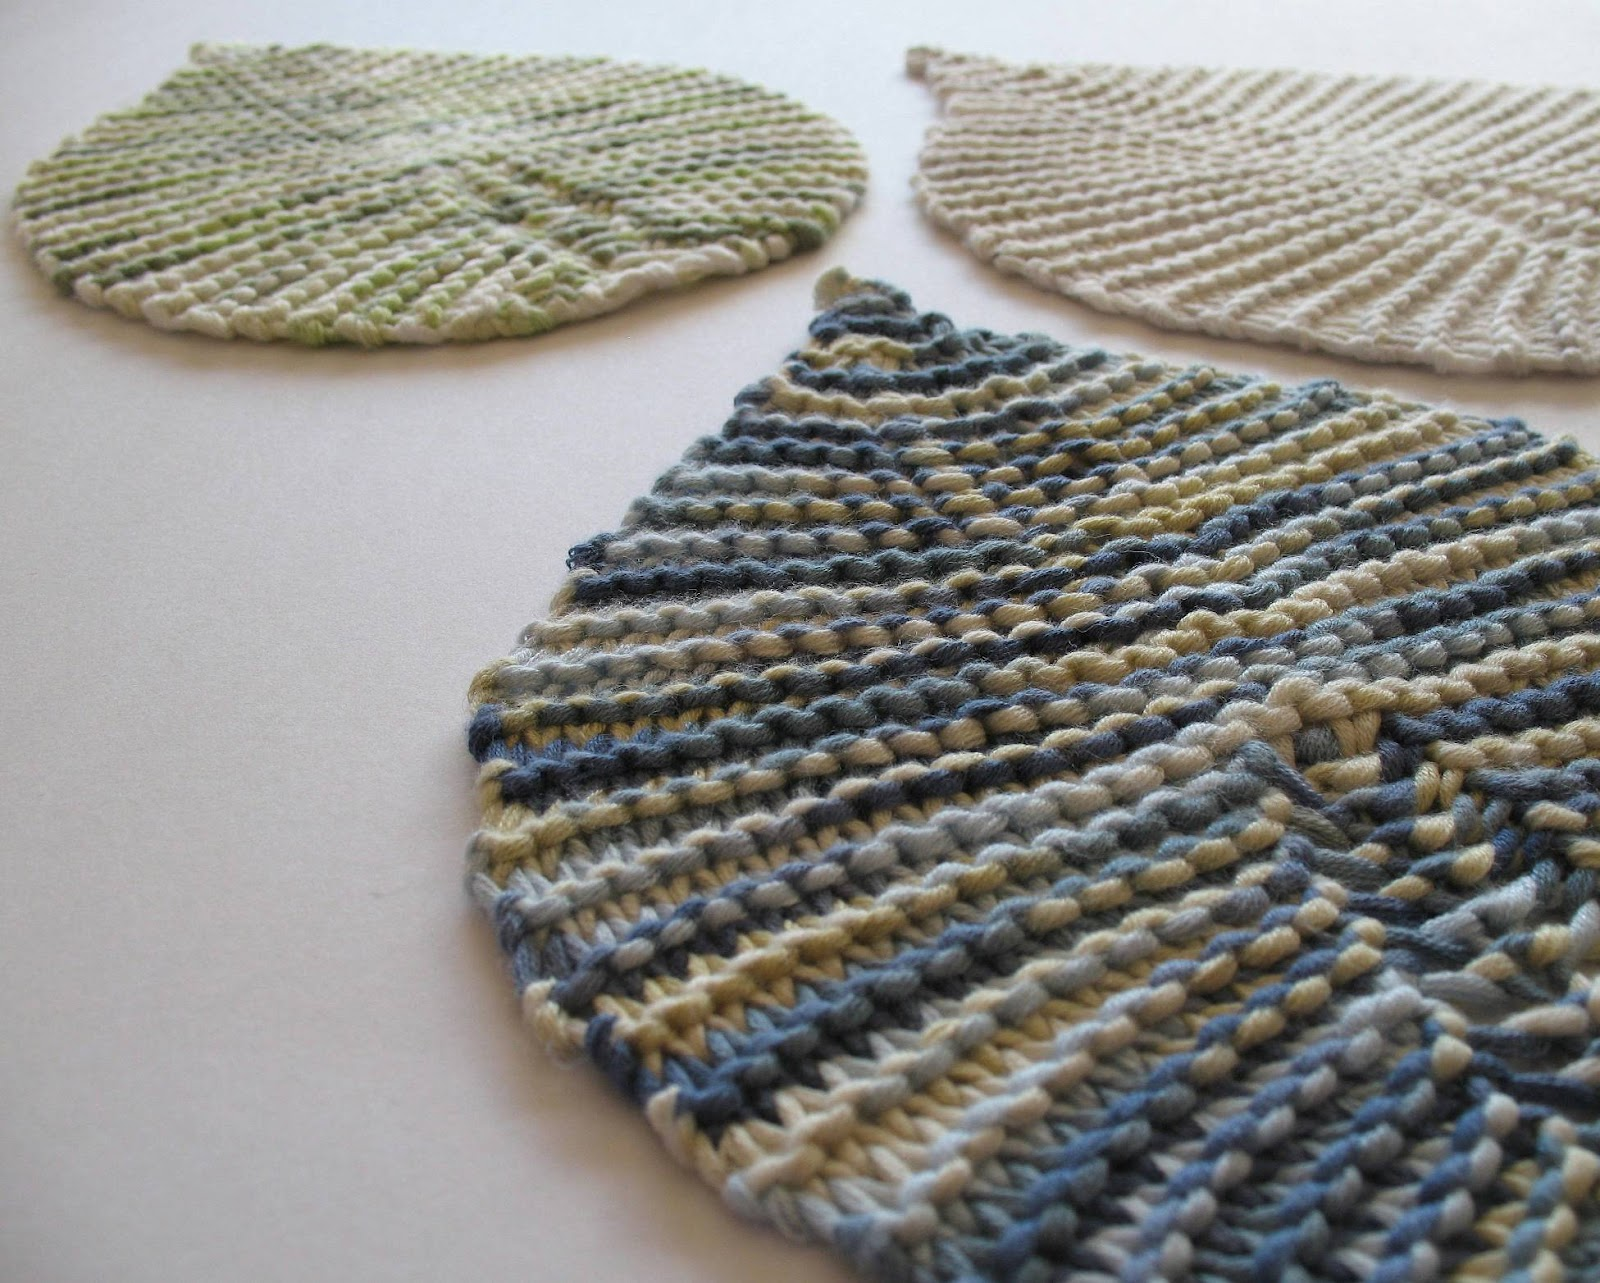 Knitting Patterns For Beginners Garter Stitch : eclectic me: garter stitch